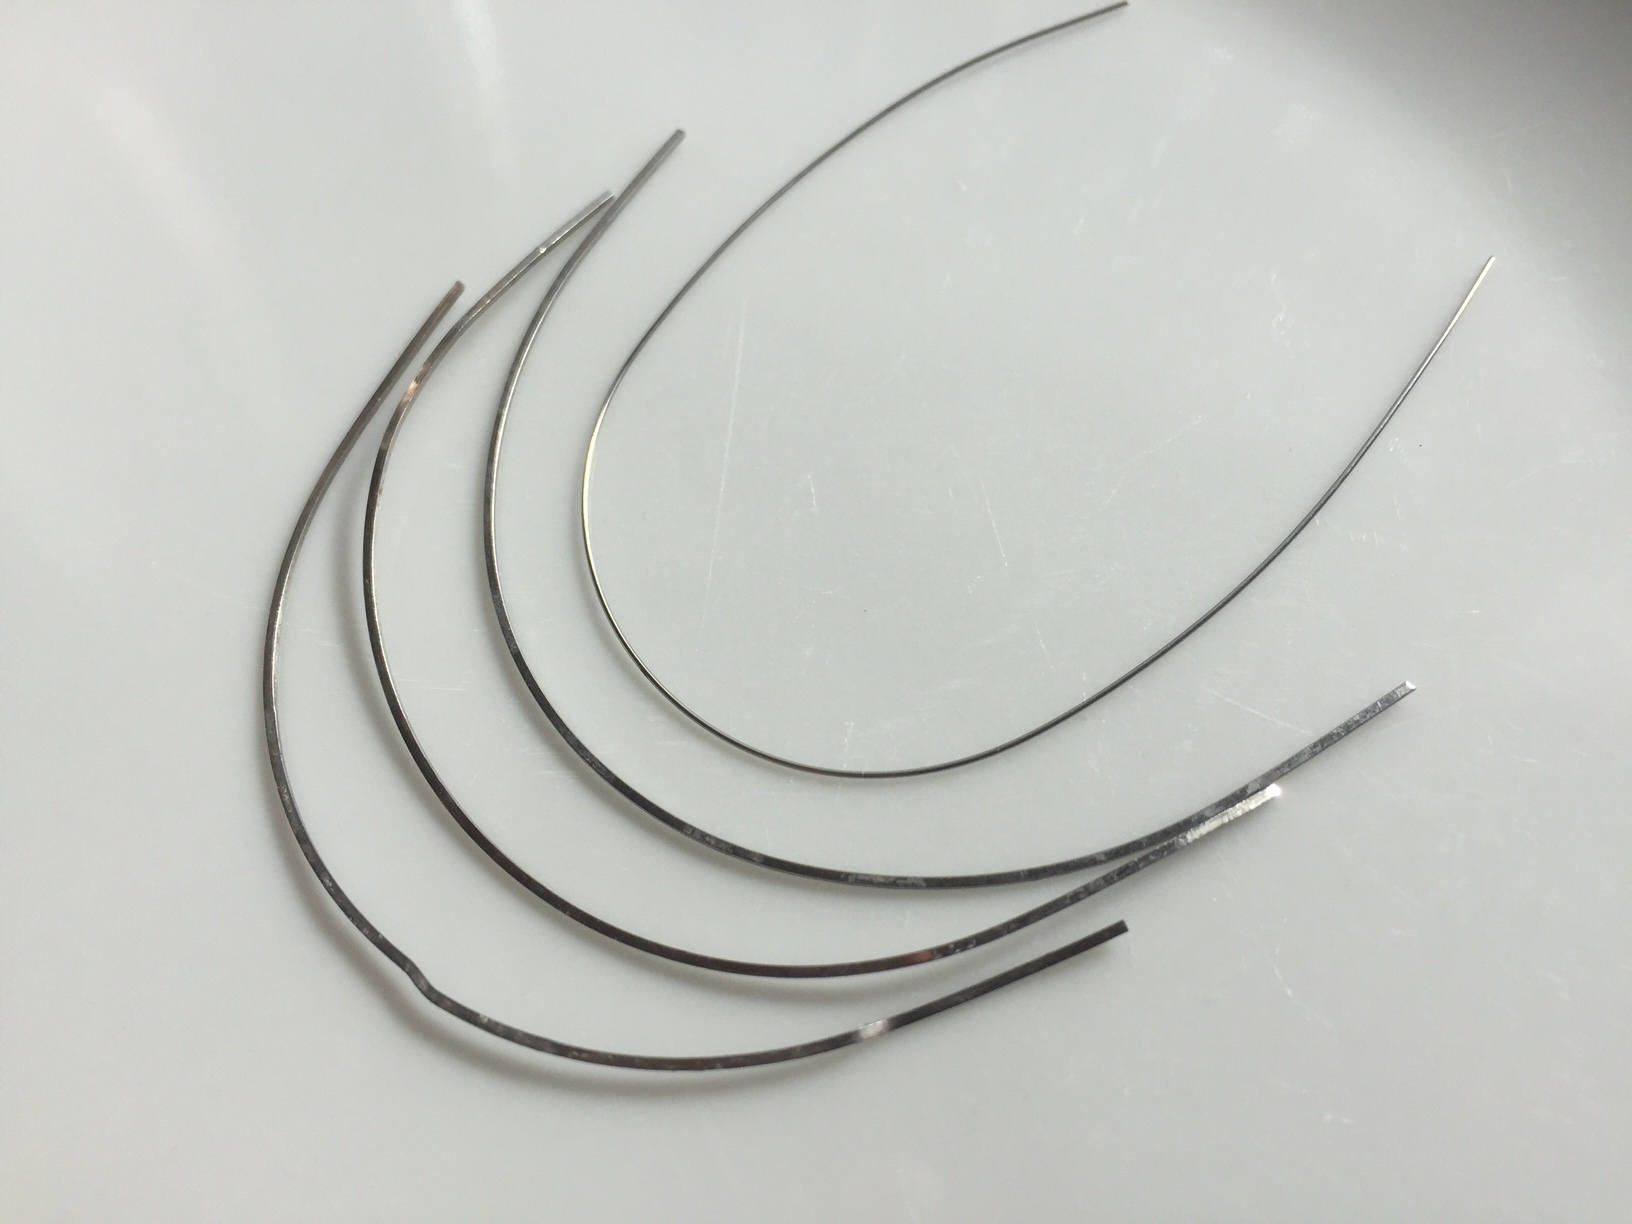 Archwires   UK Adult Braces